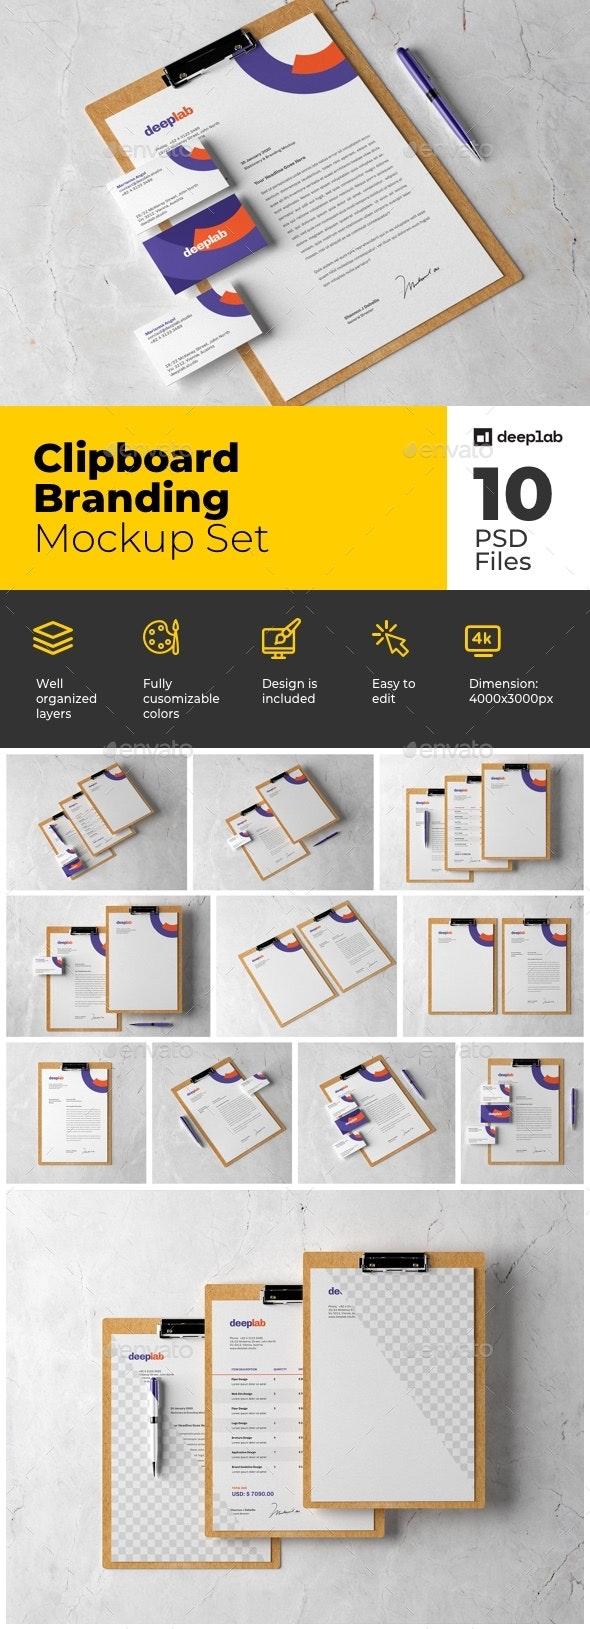 Kraft Clipboard Branding Mockup Set - Product Mock-Ups Graphics